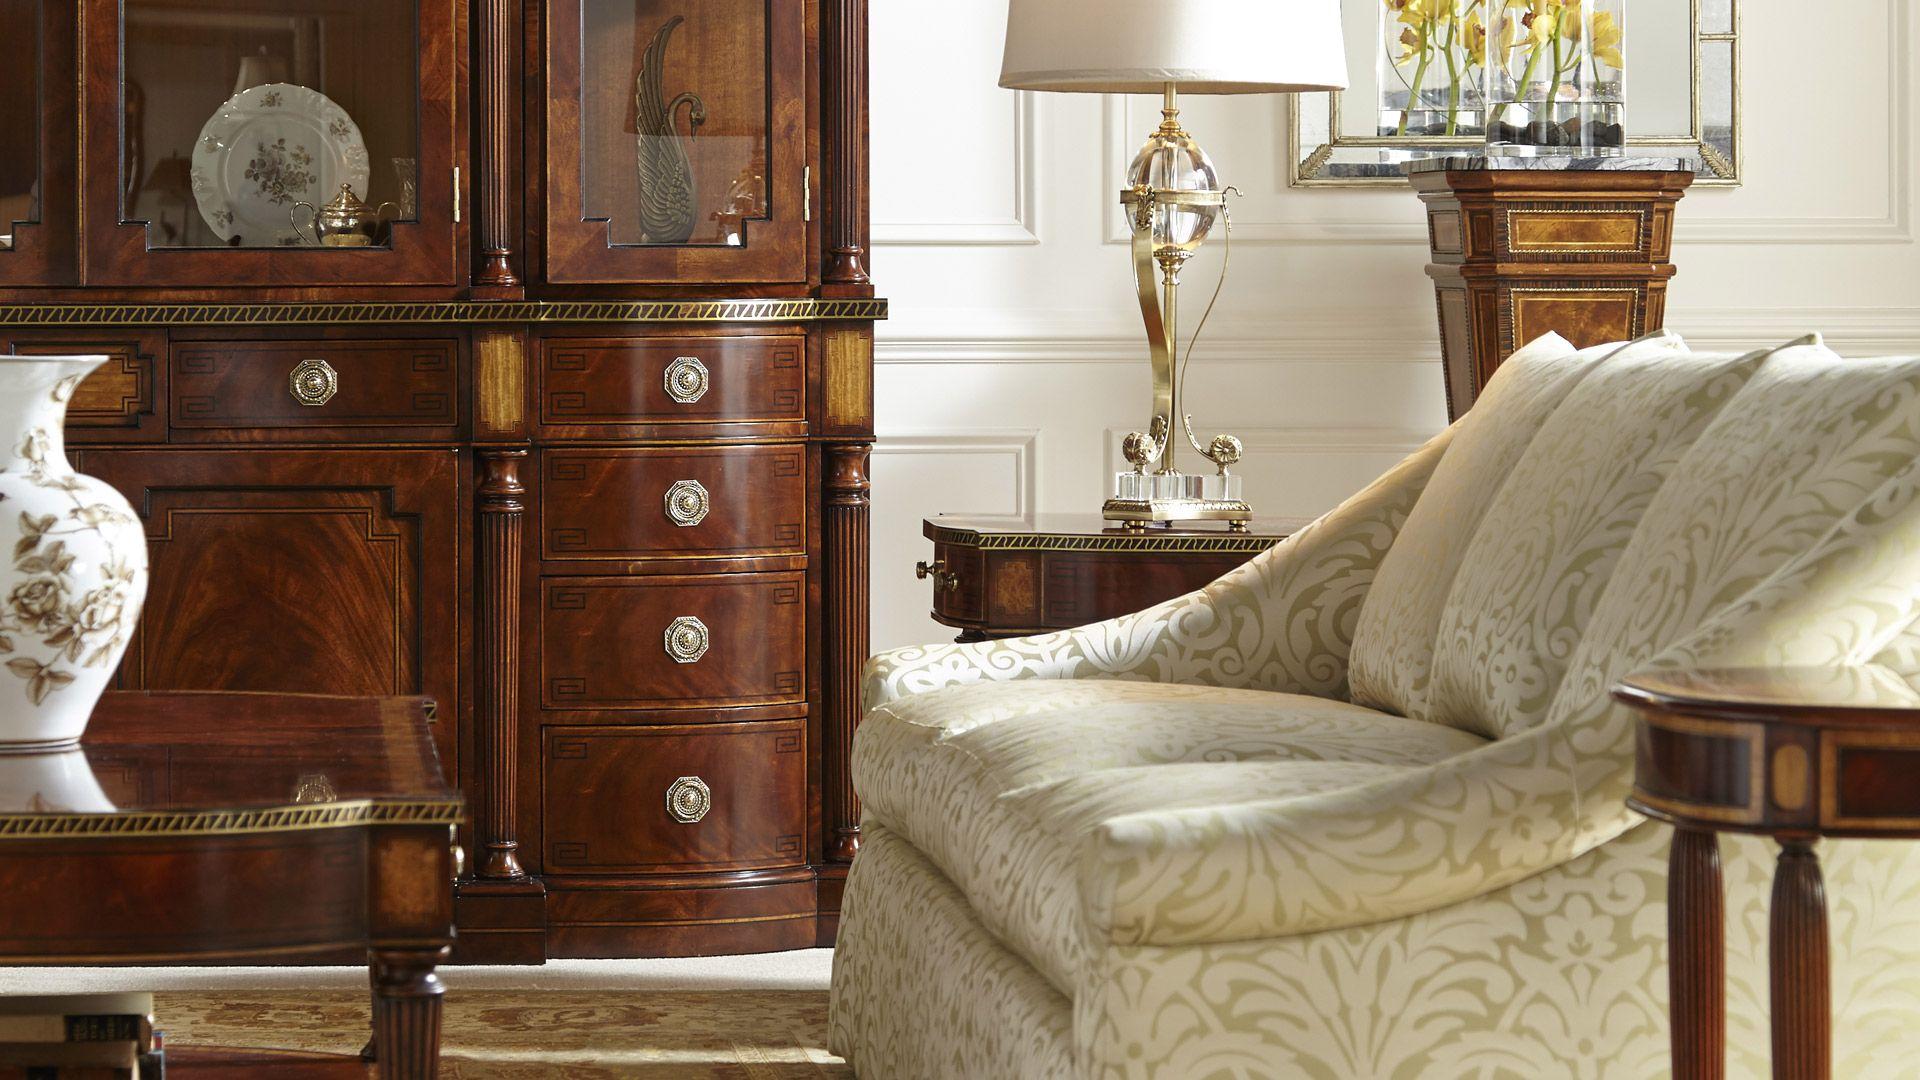 Freenom World Home, Home decor, Home furnishings